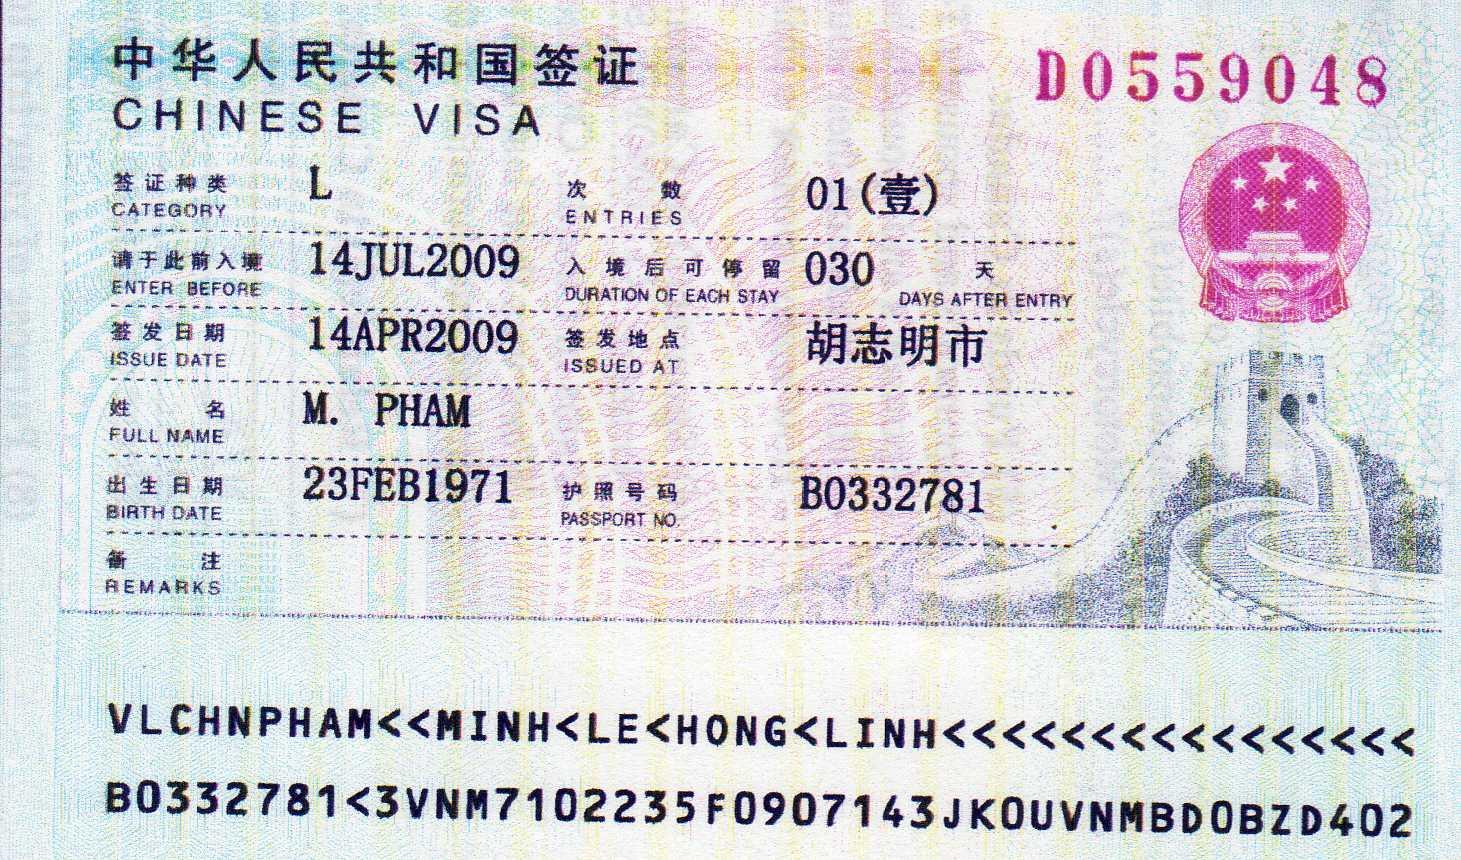 thu-tuc-xin-visa-trung-quoc-6